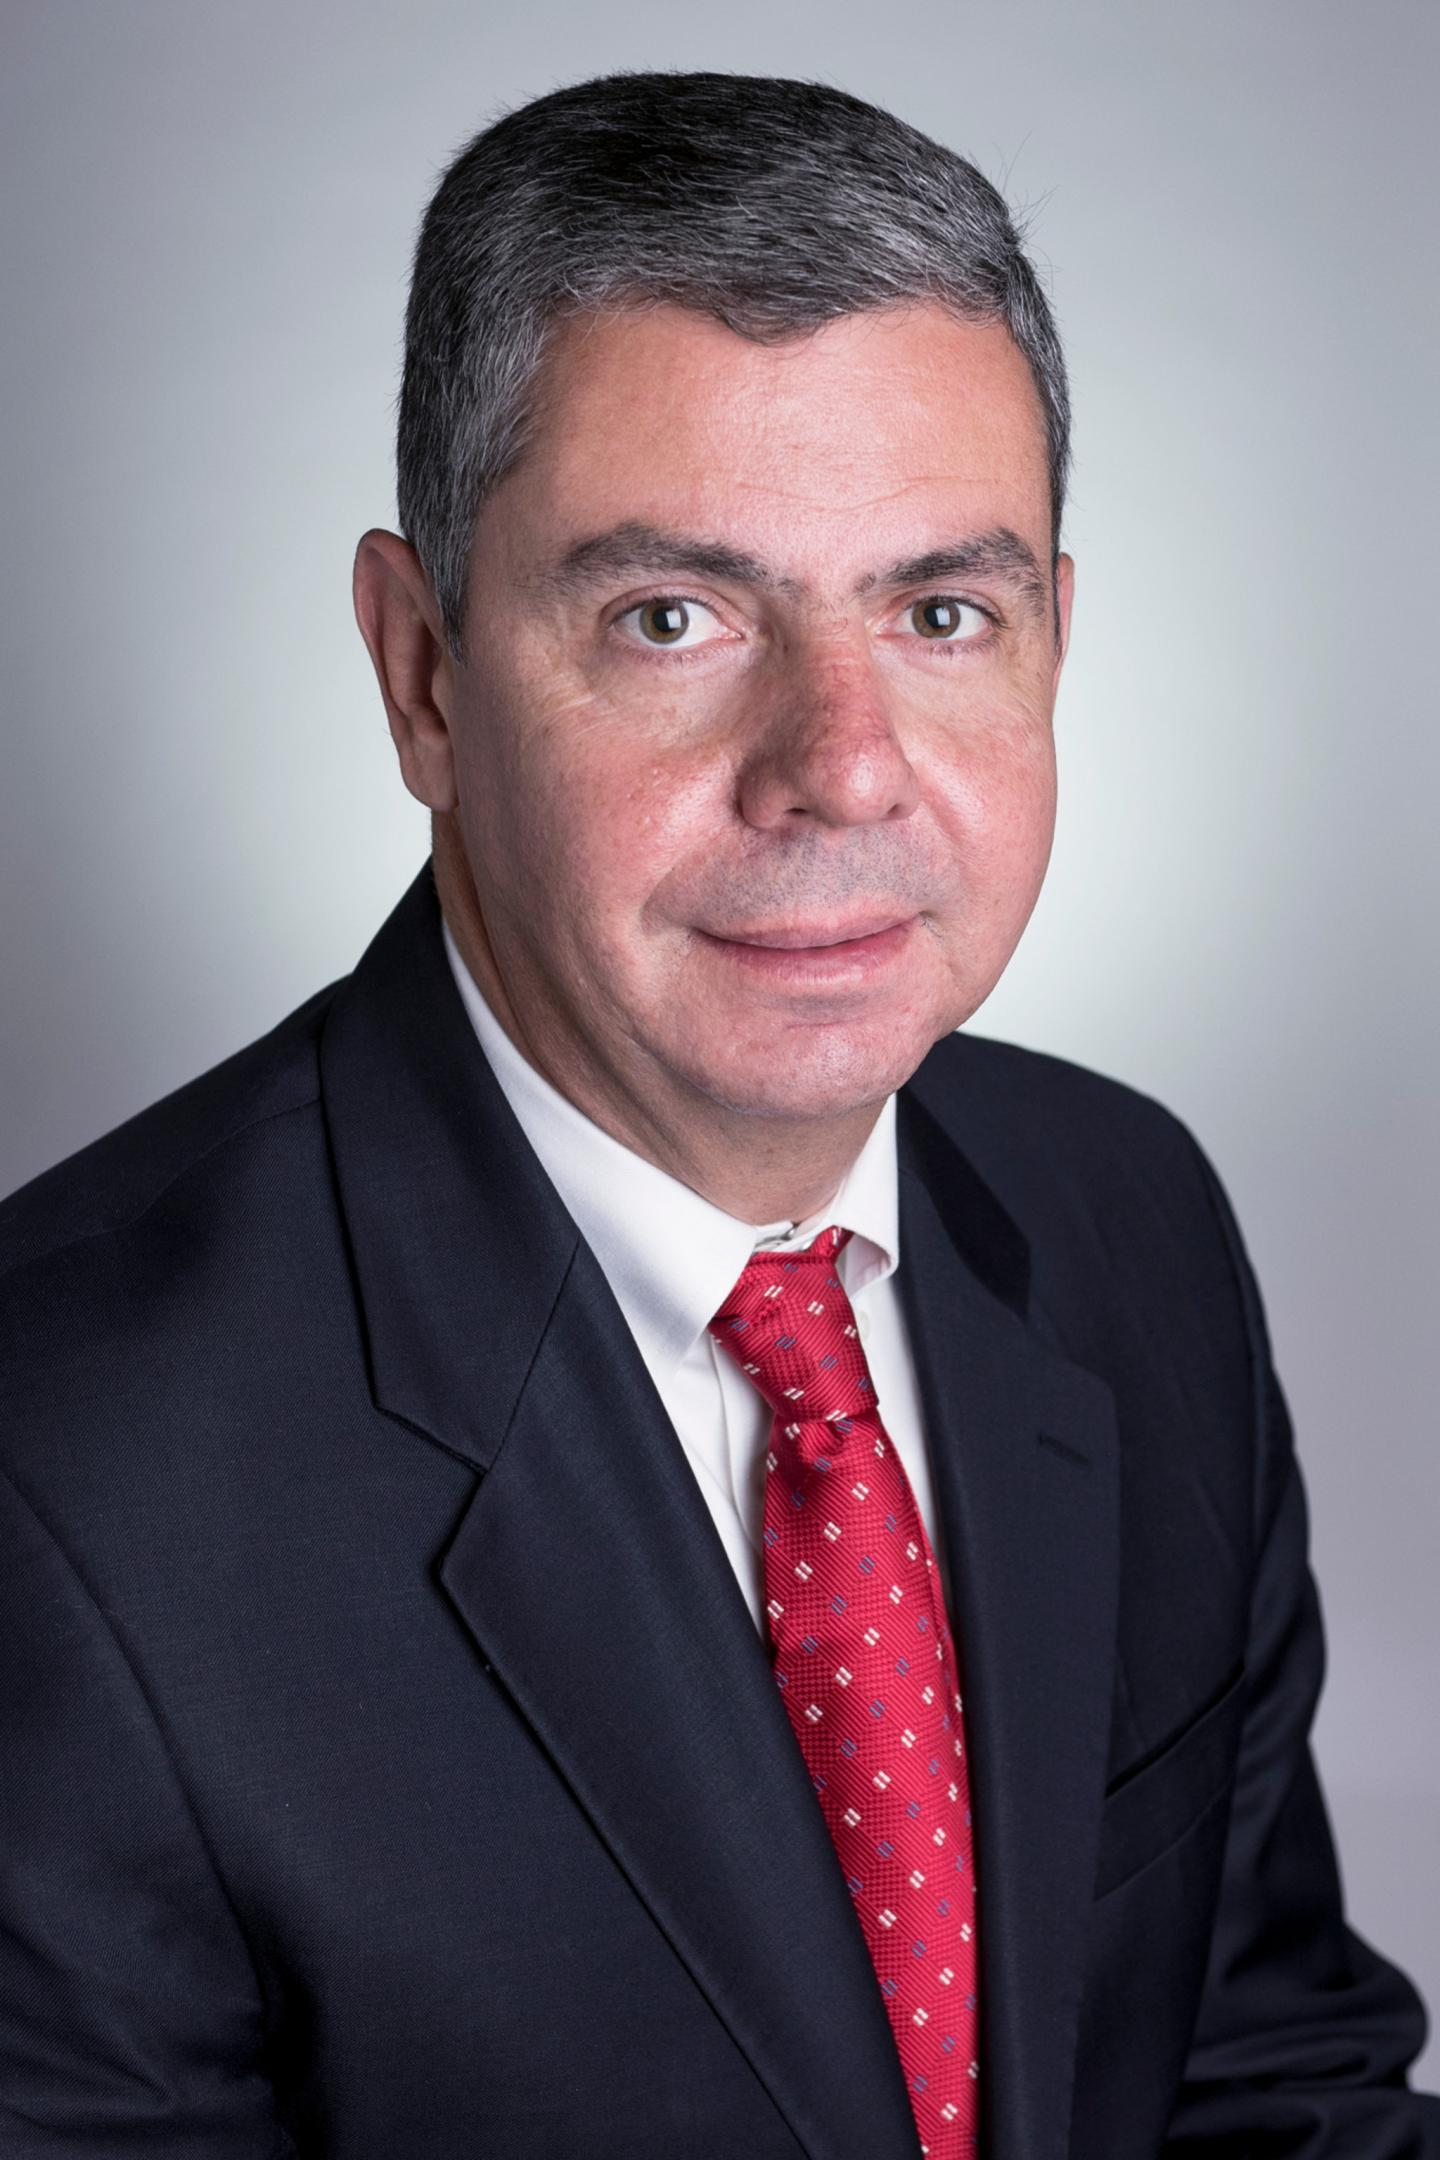 Gilvan C. 'Gil' Souza, Indiana University